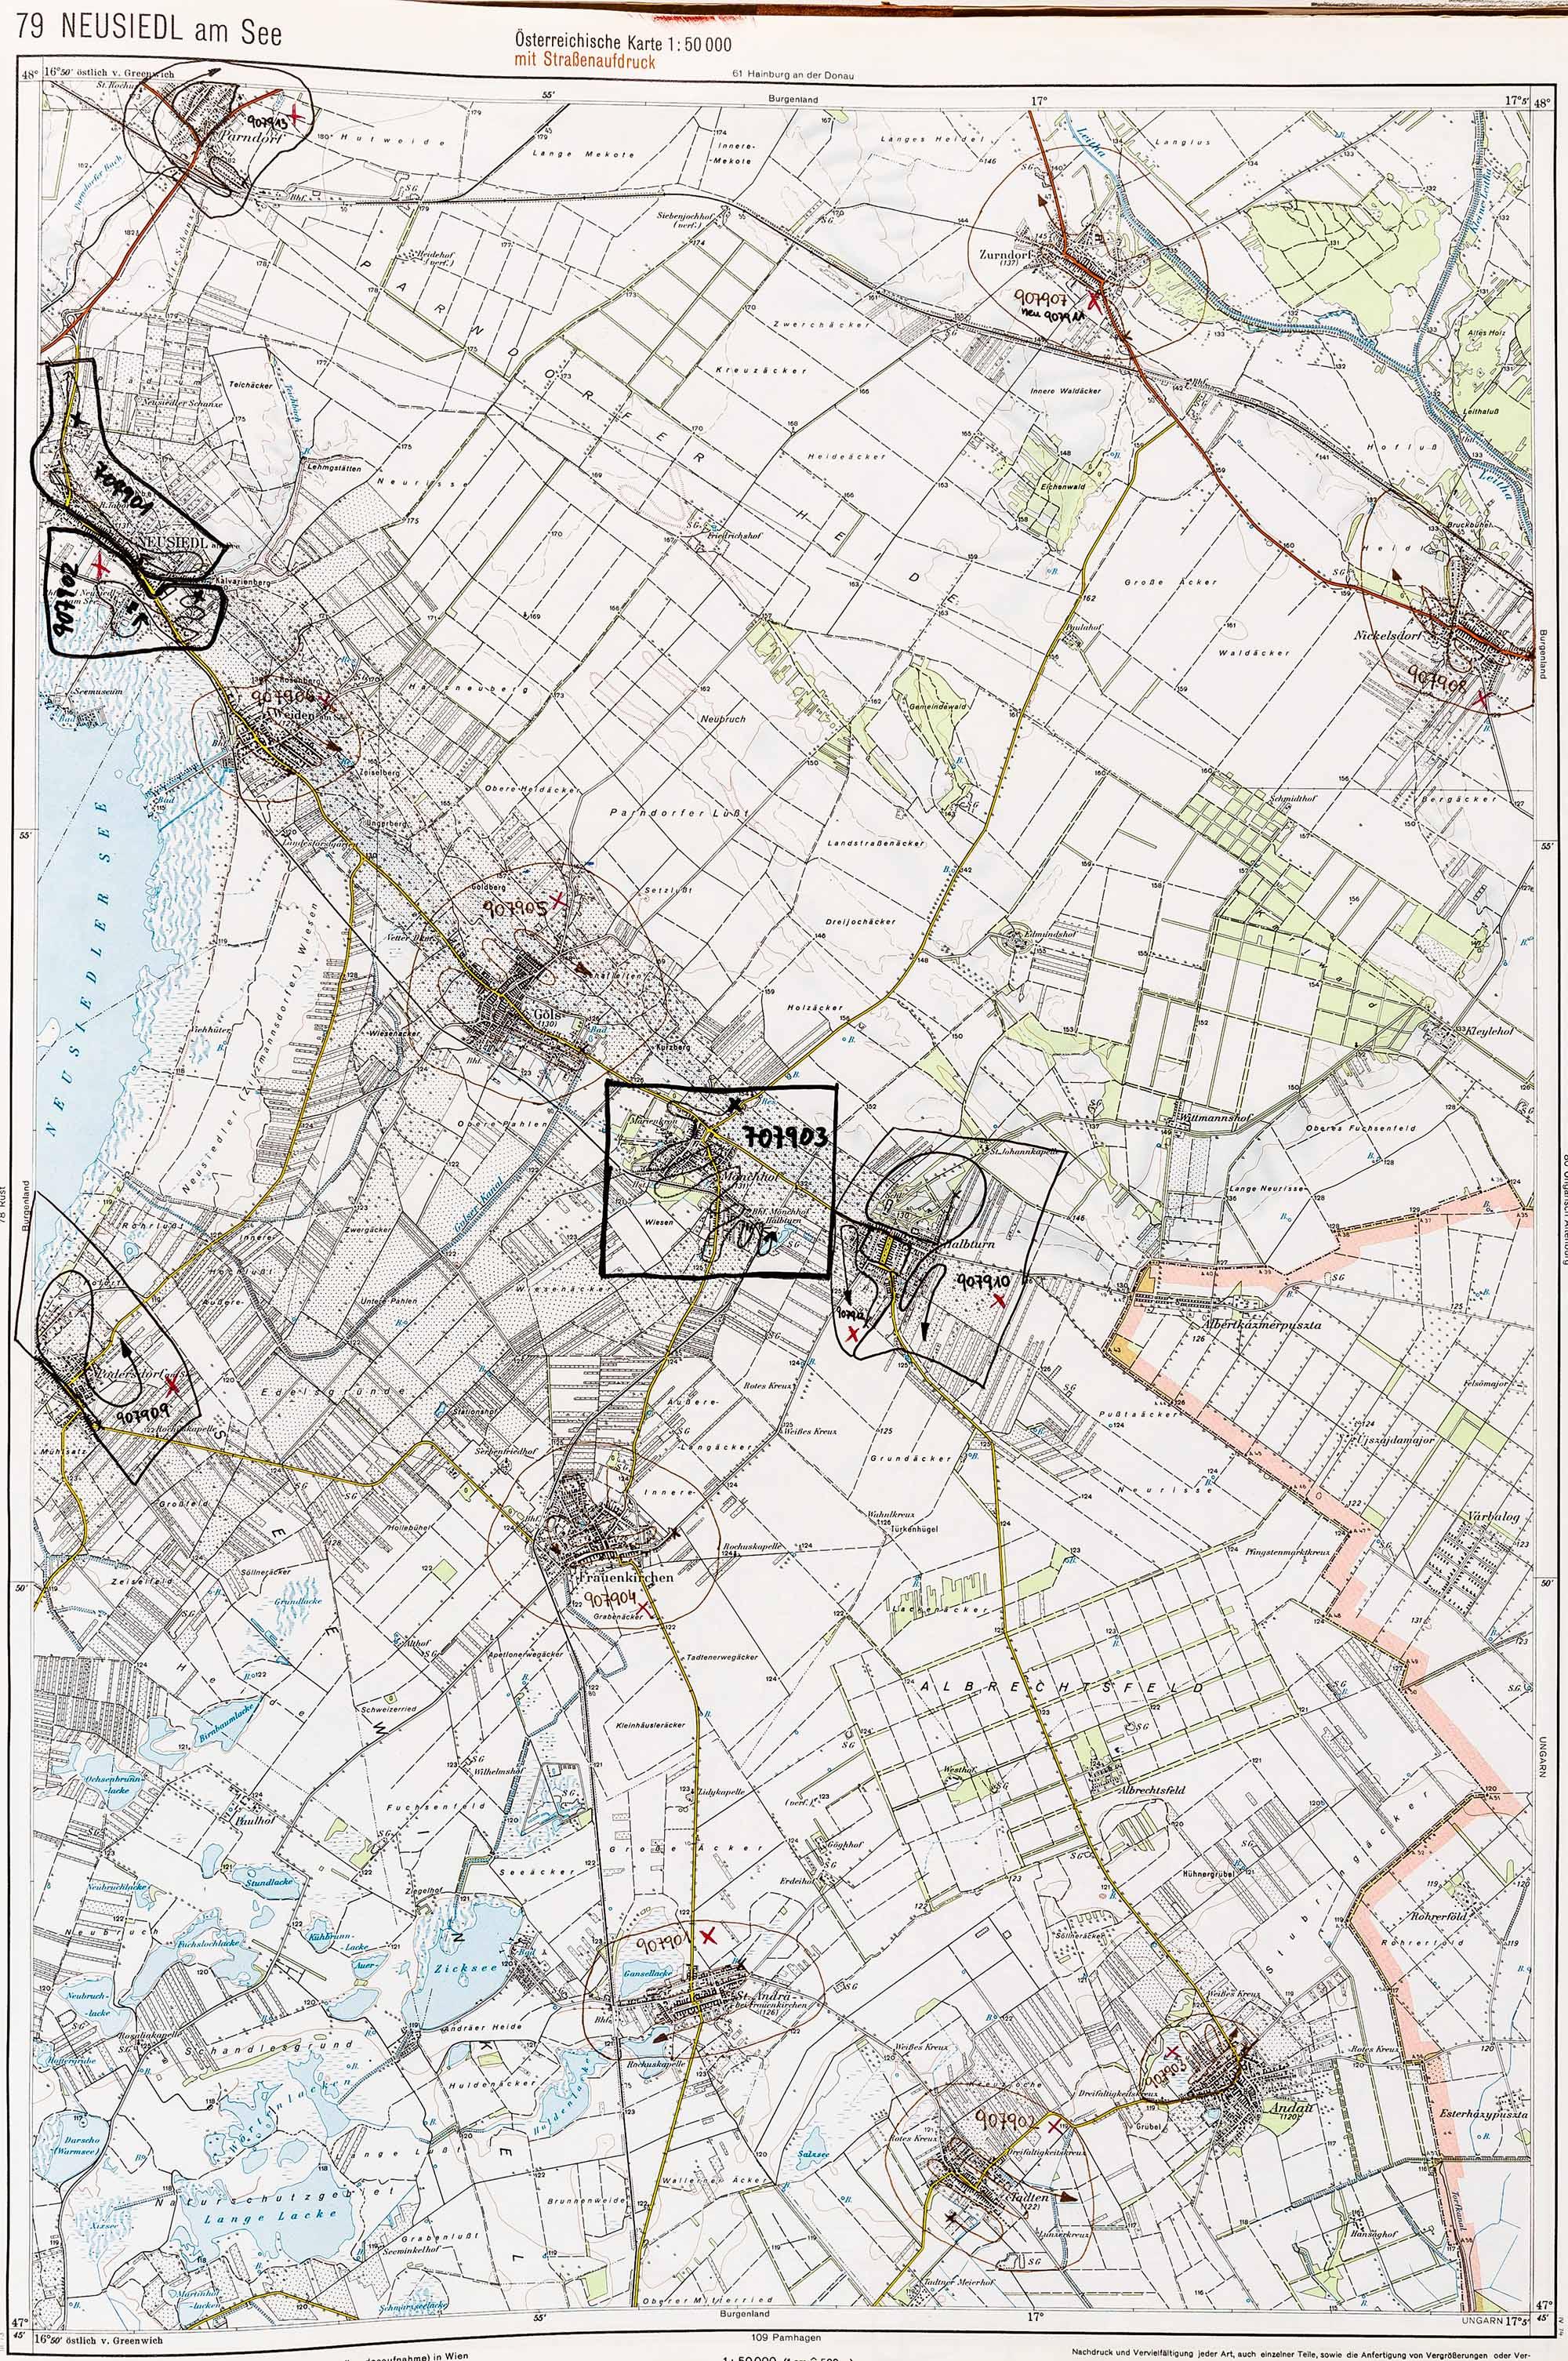 1975-1979 Karte 079